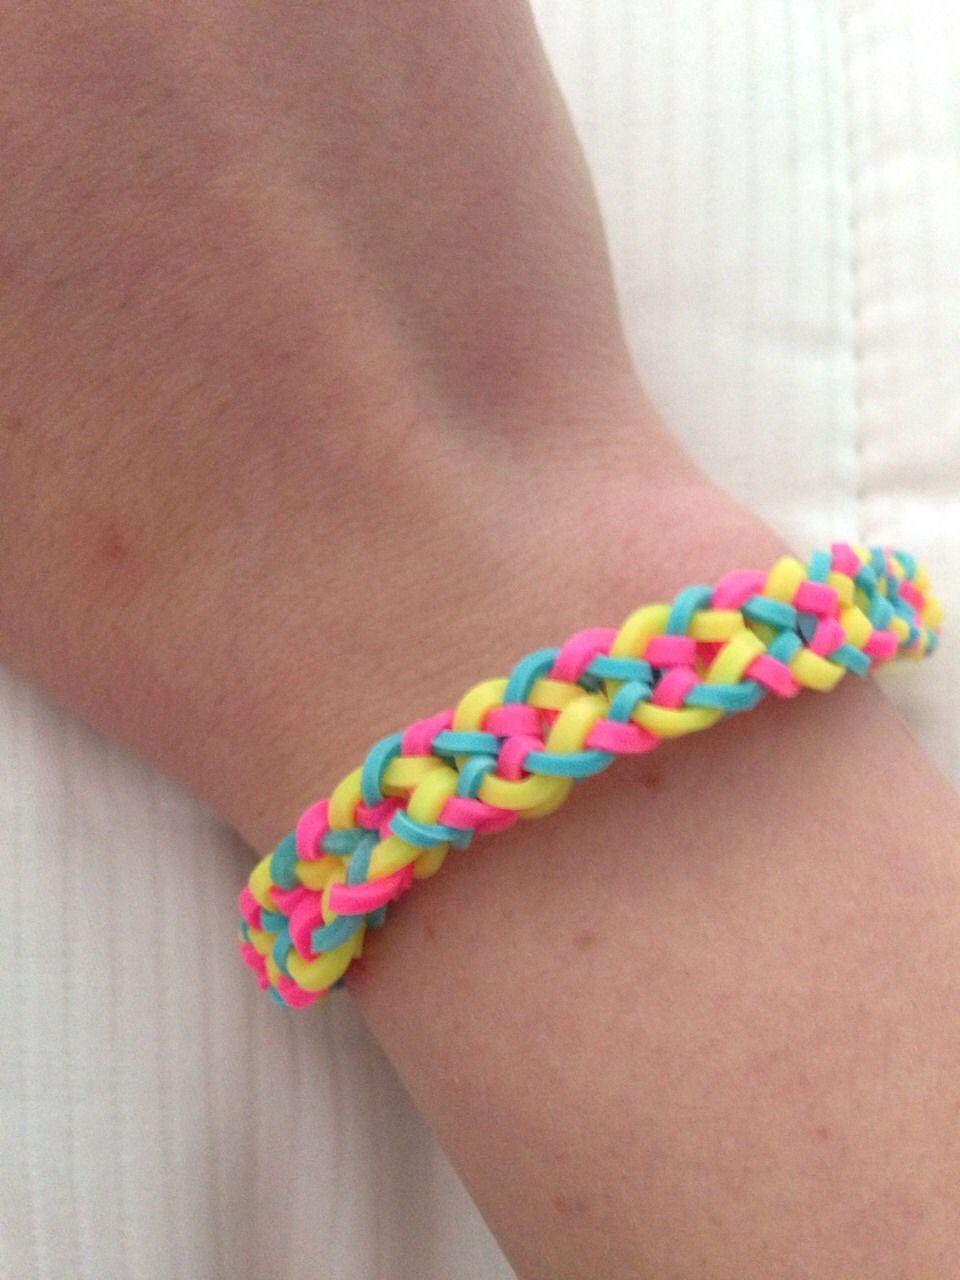 Buy Loom rainbow bracelets fishtail pattern photo picture trends